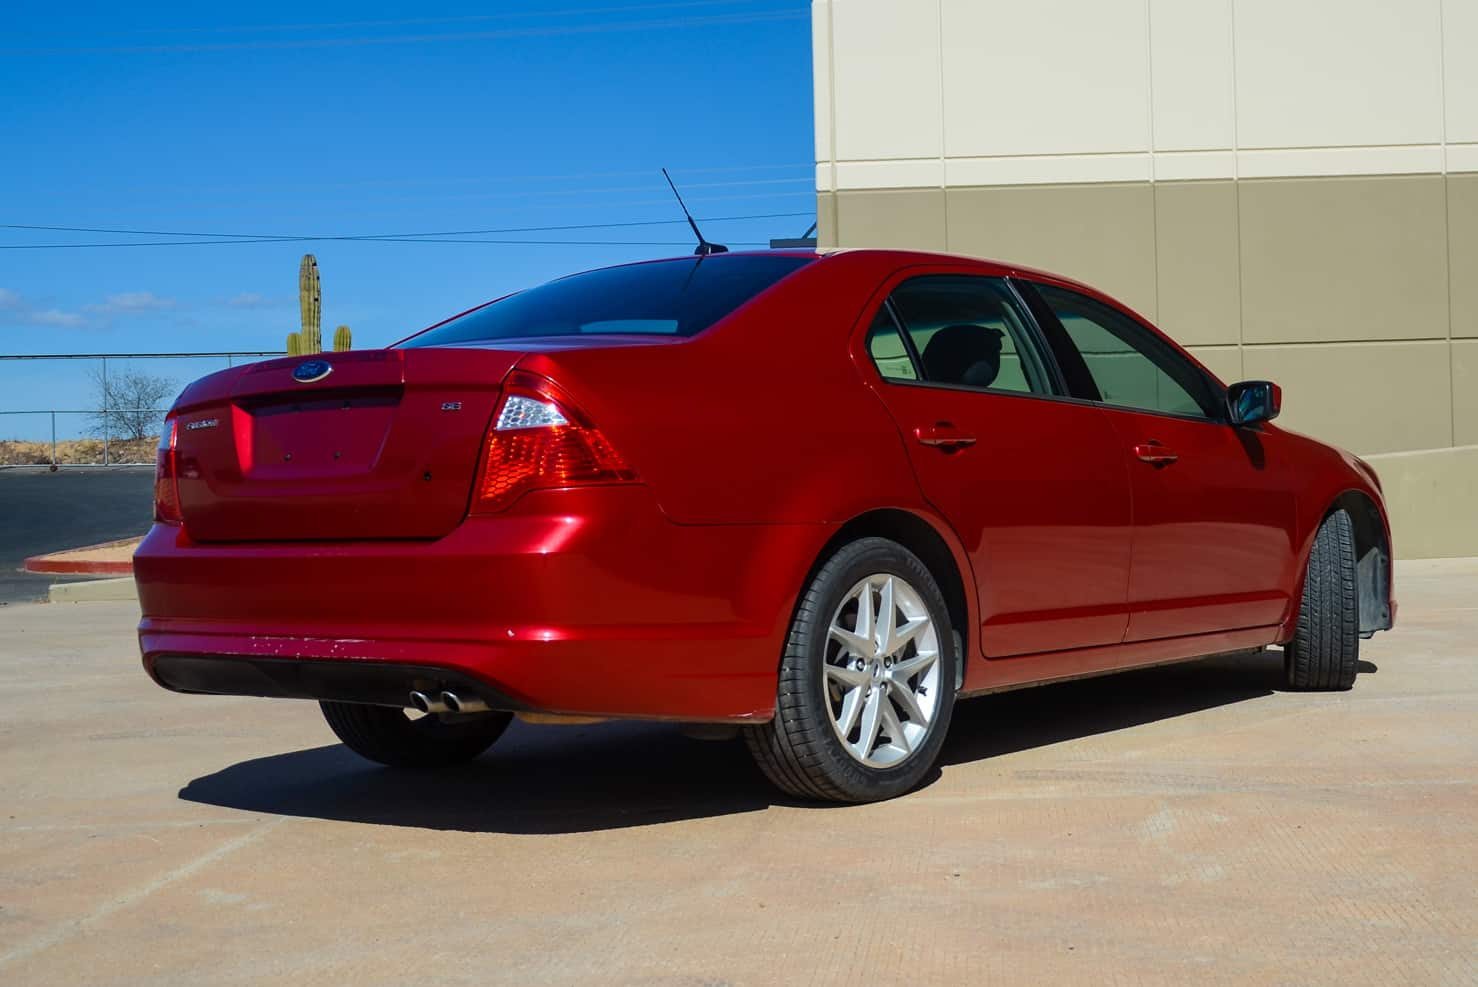 Ford Fusion Mid-Sized Sedan